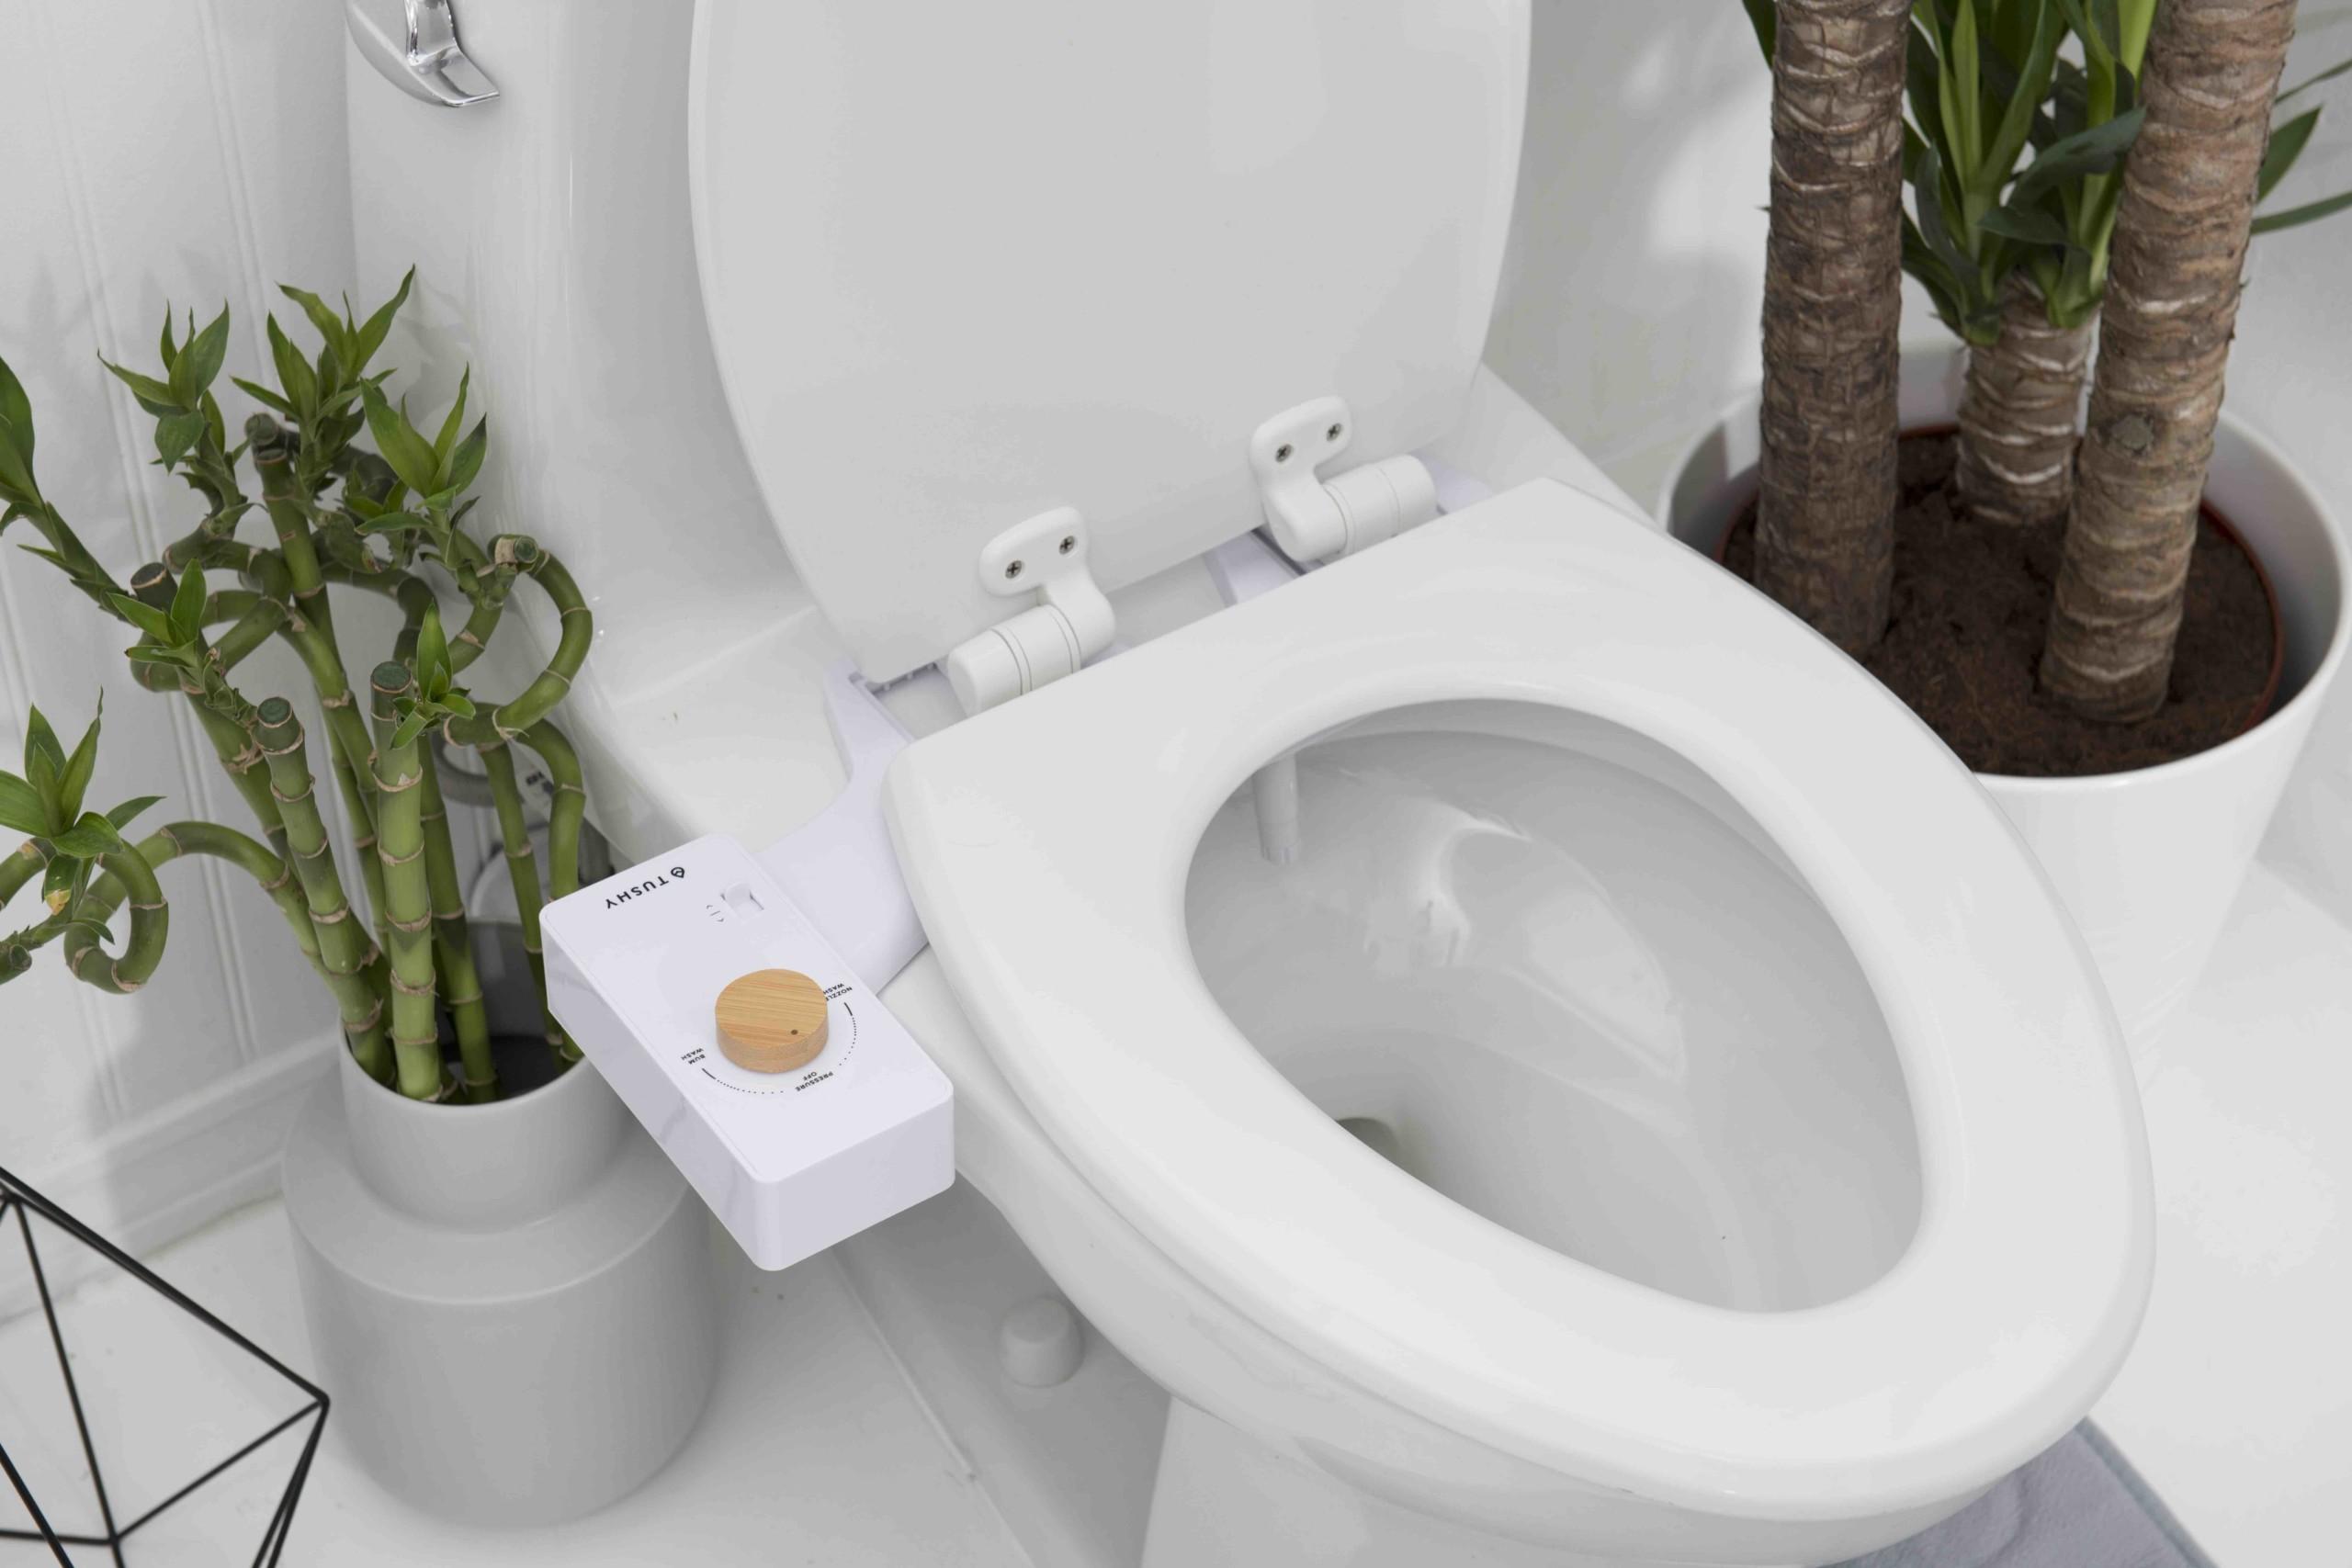 Tushy Classic Bidet Toilet Attachment